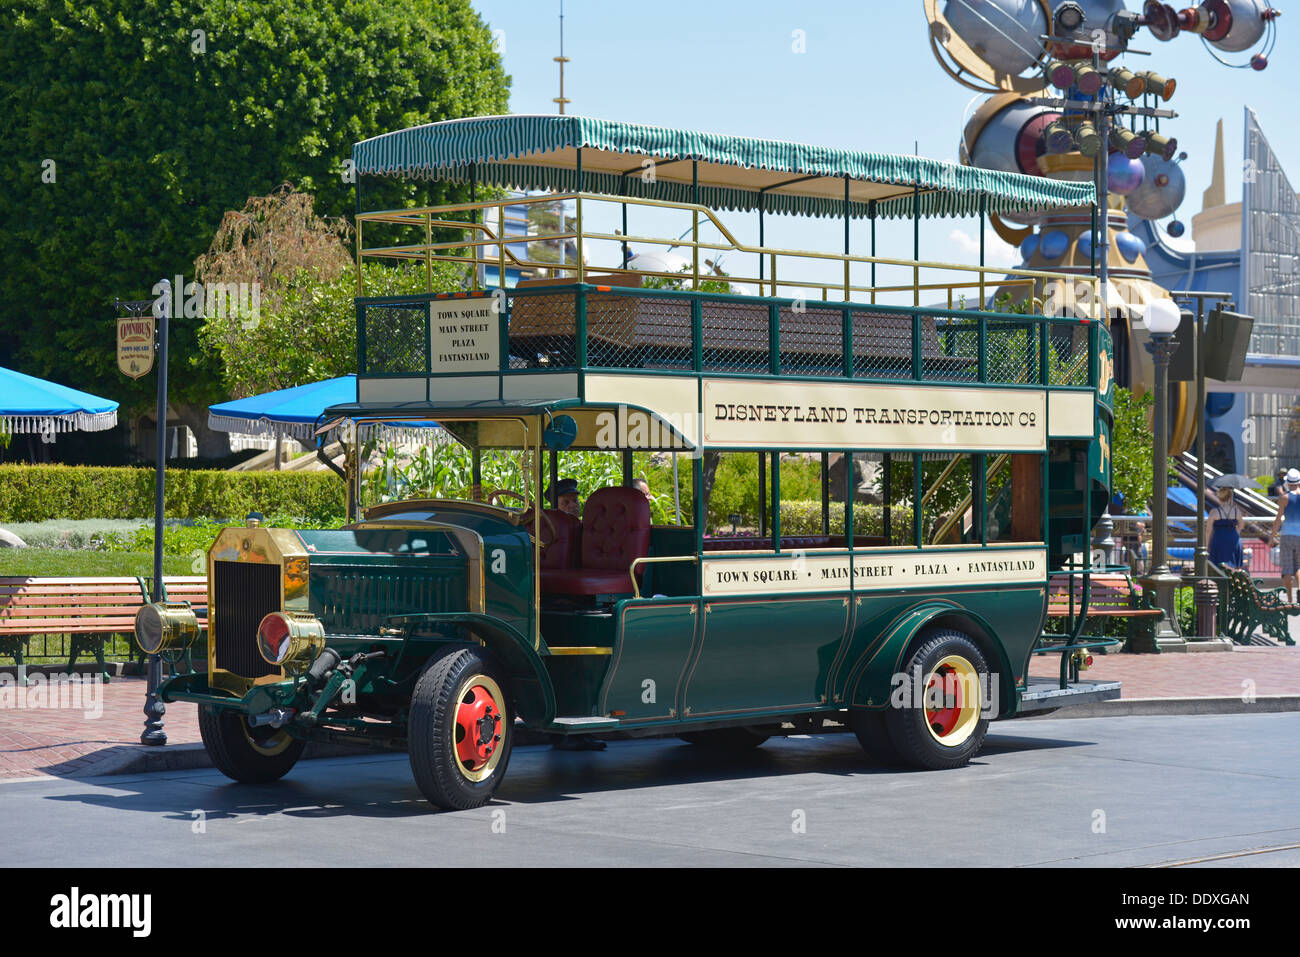 Disneyland Transportation, Trolley, Bus, Anaheim, California - Stock Image